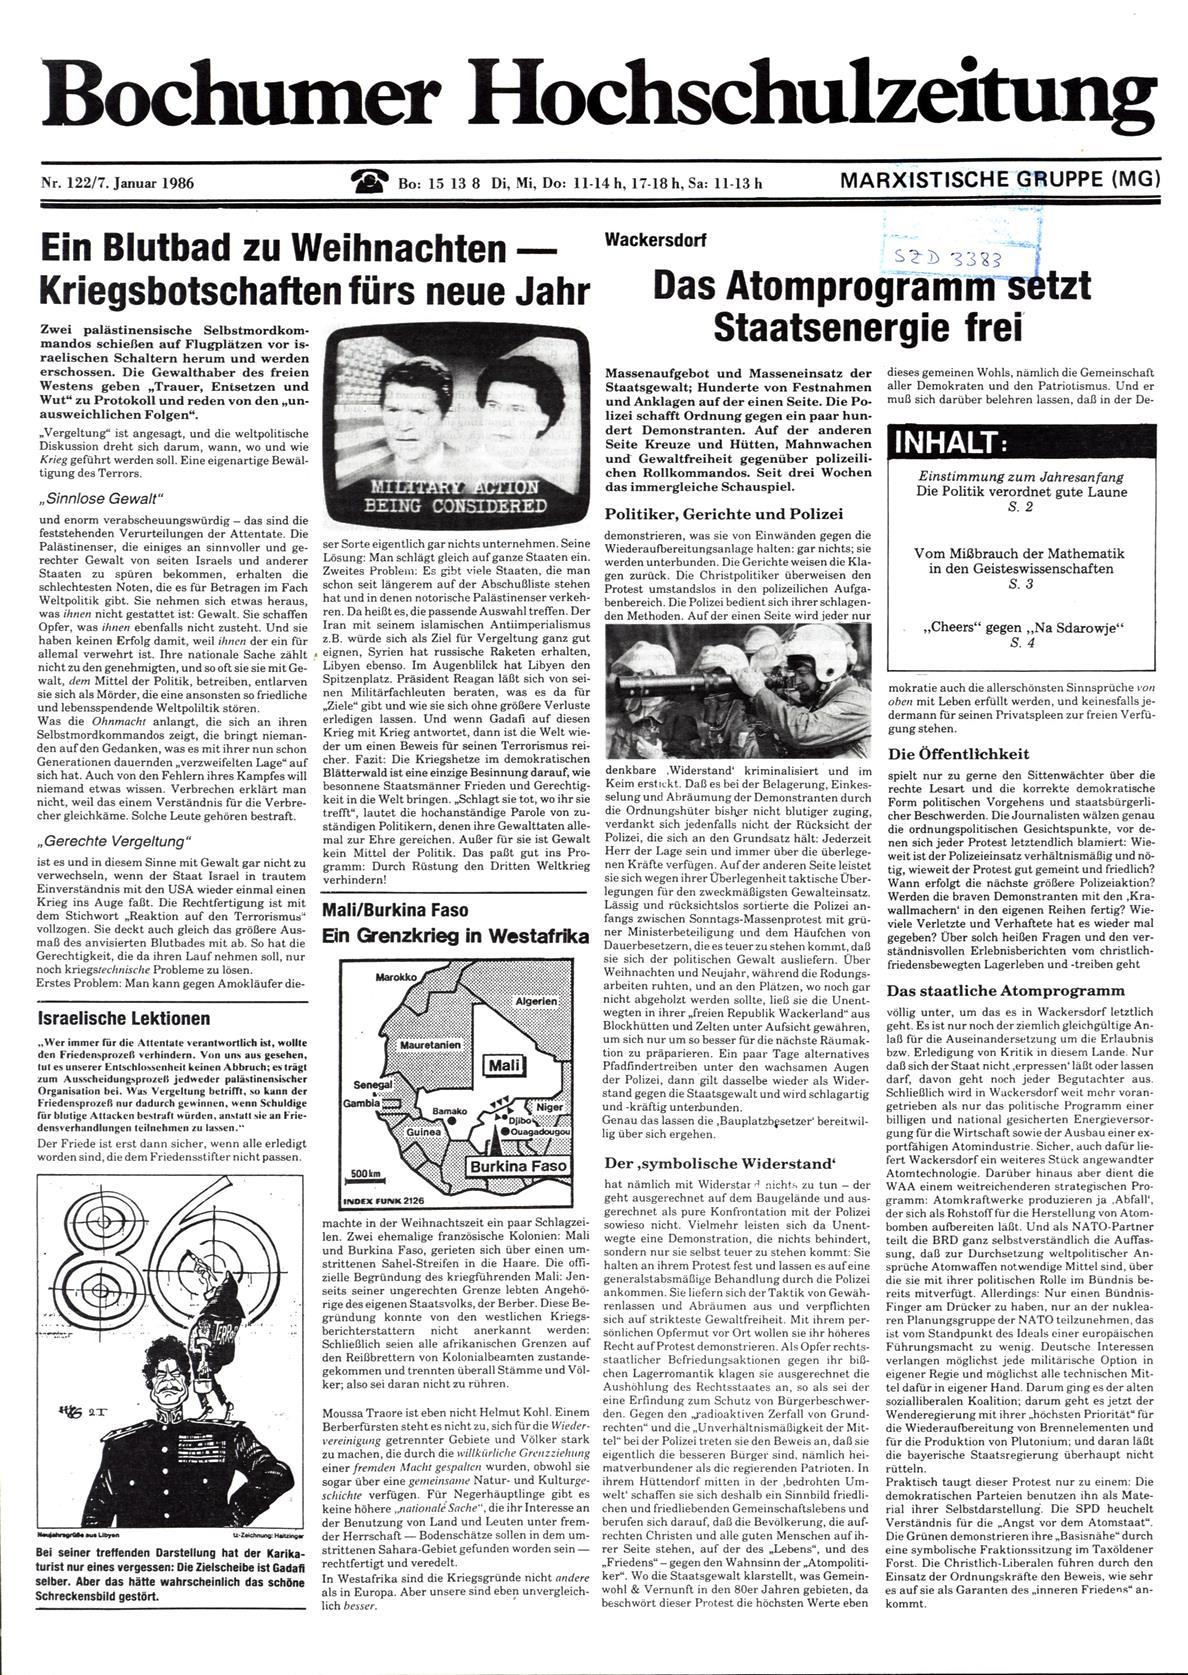 Bochum_BHZ_19860107_122_001